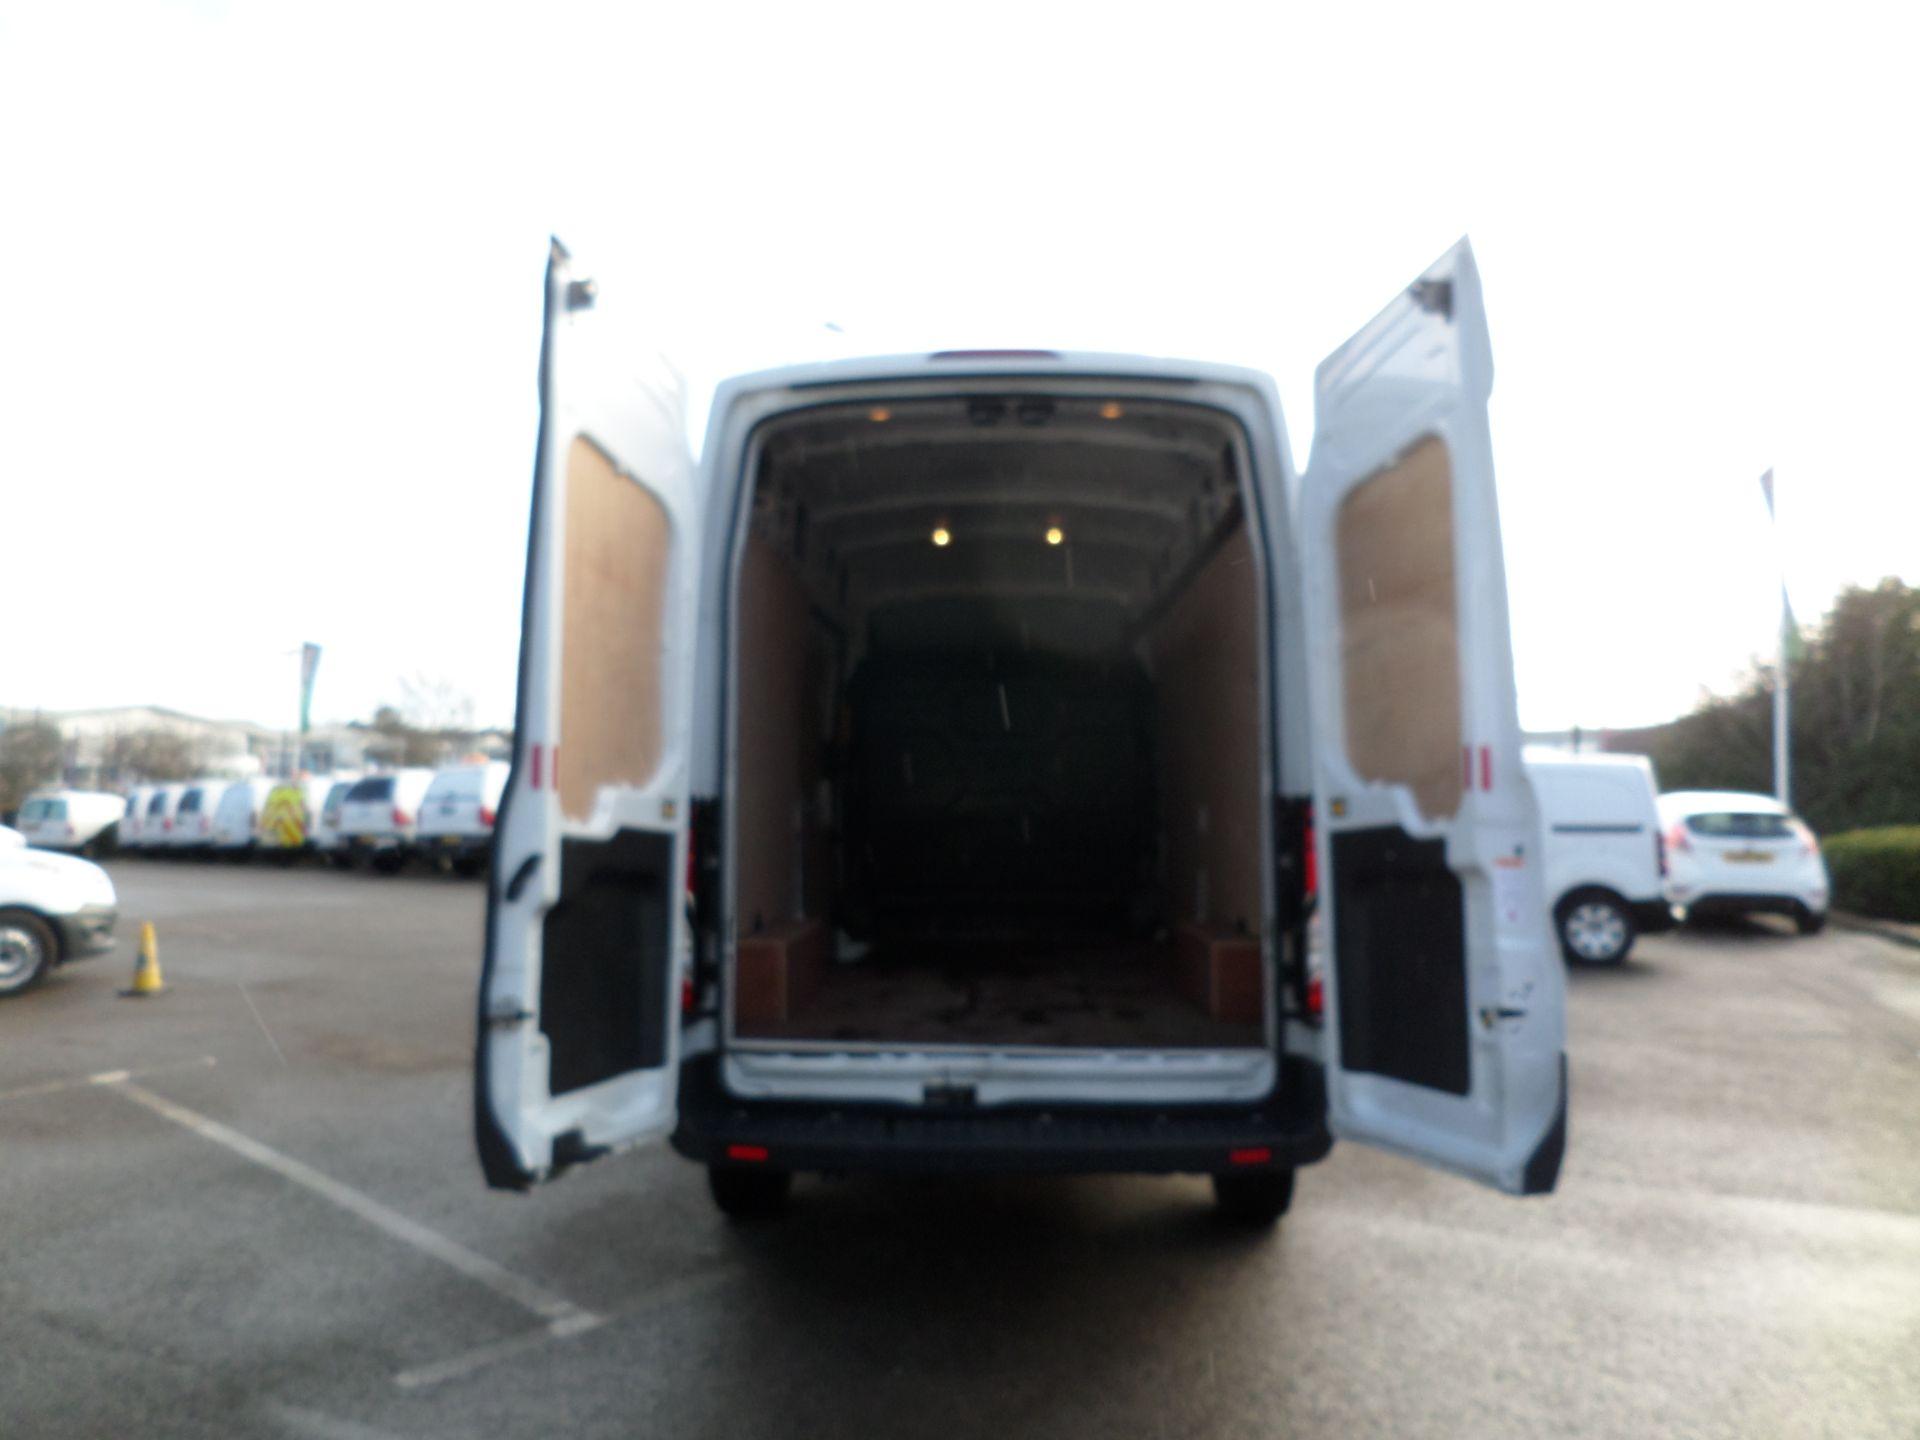 2018 Ford Transit 2.0 Tdci 130Ps H3 Van Euro 6 (WV18JXH) Image 4